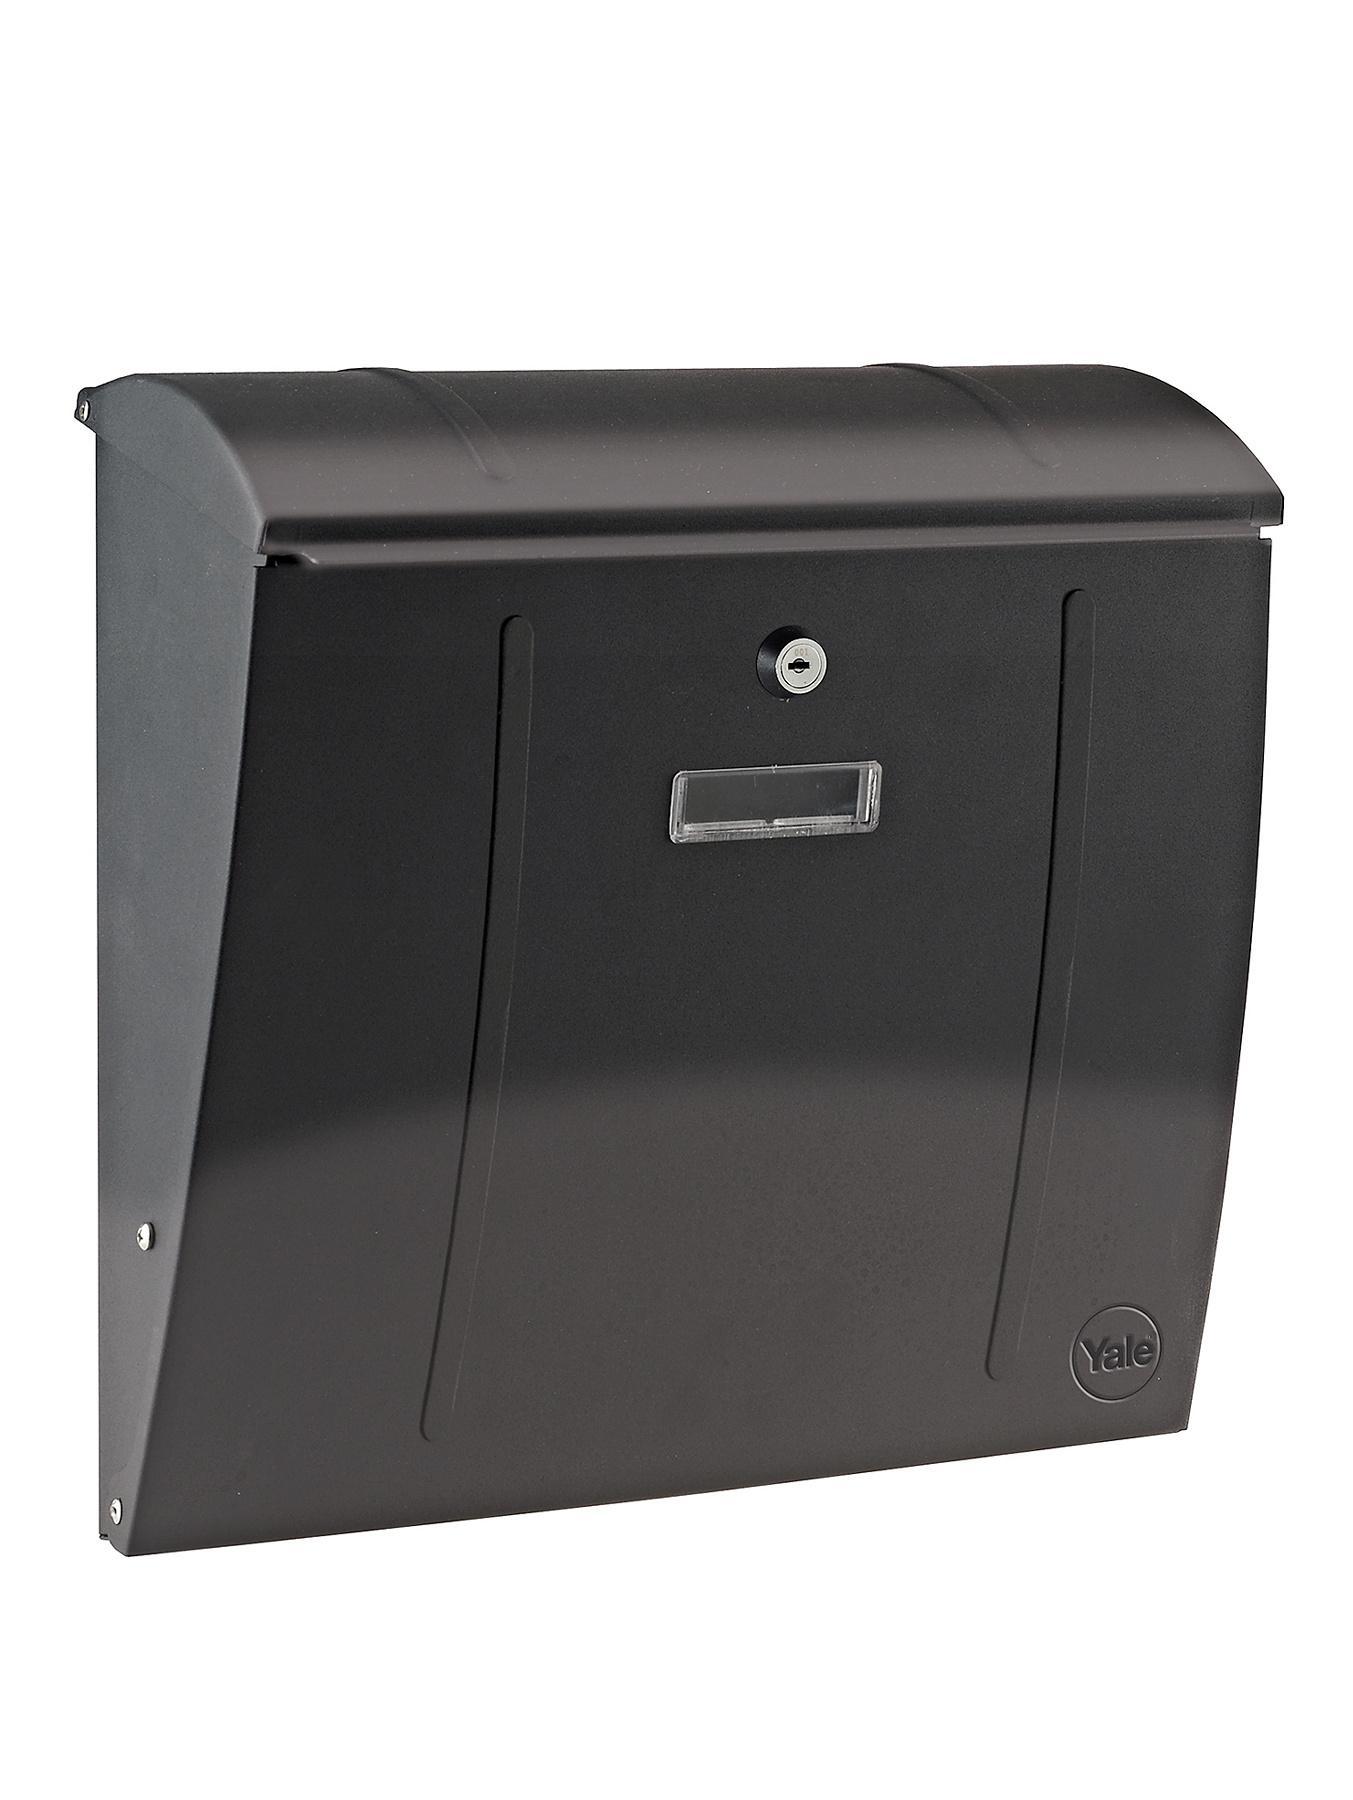 Yale Postmaster Delaware - Black